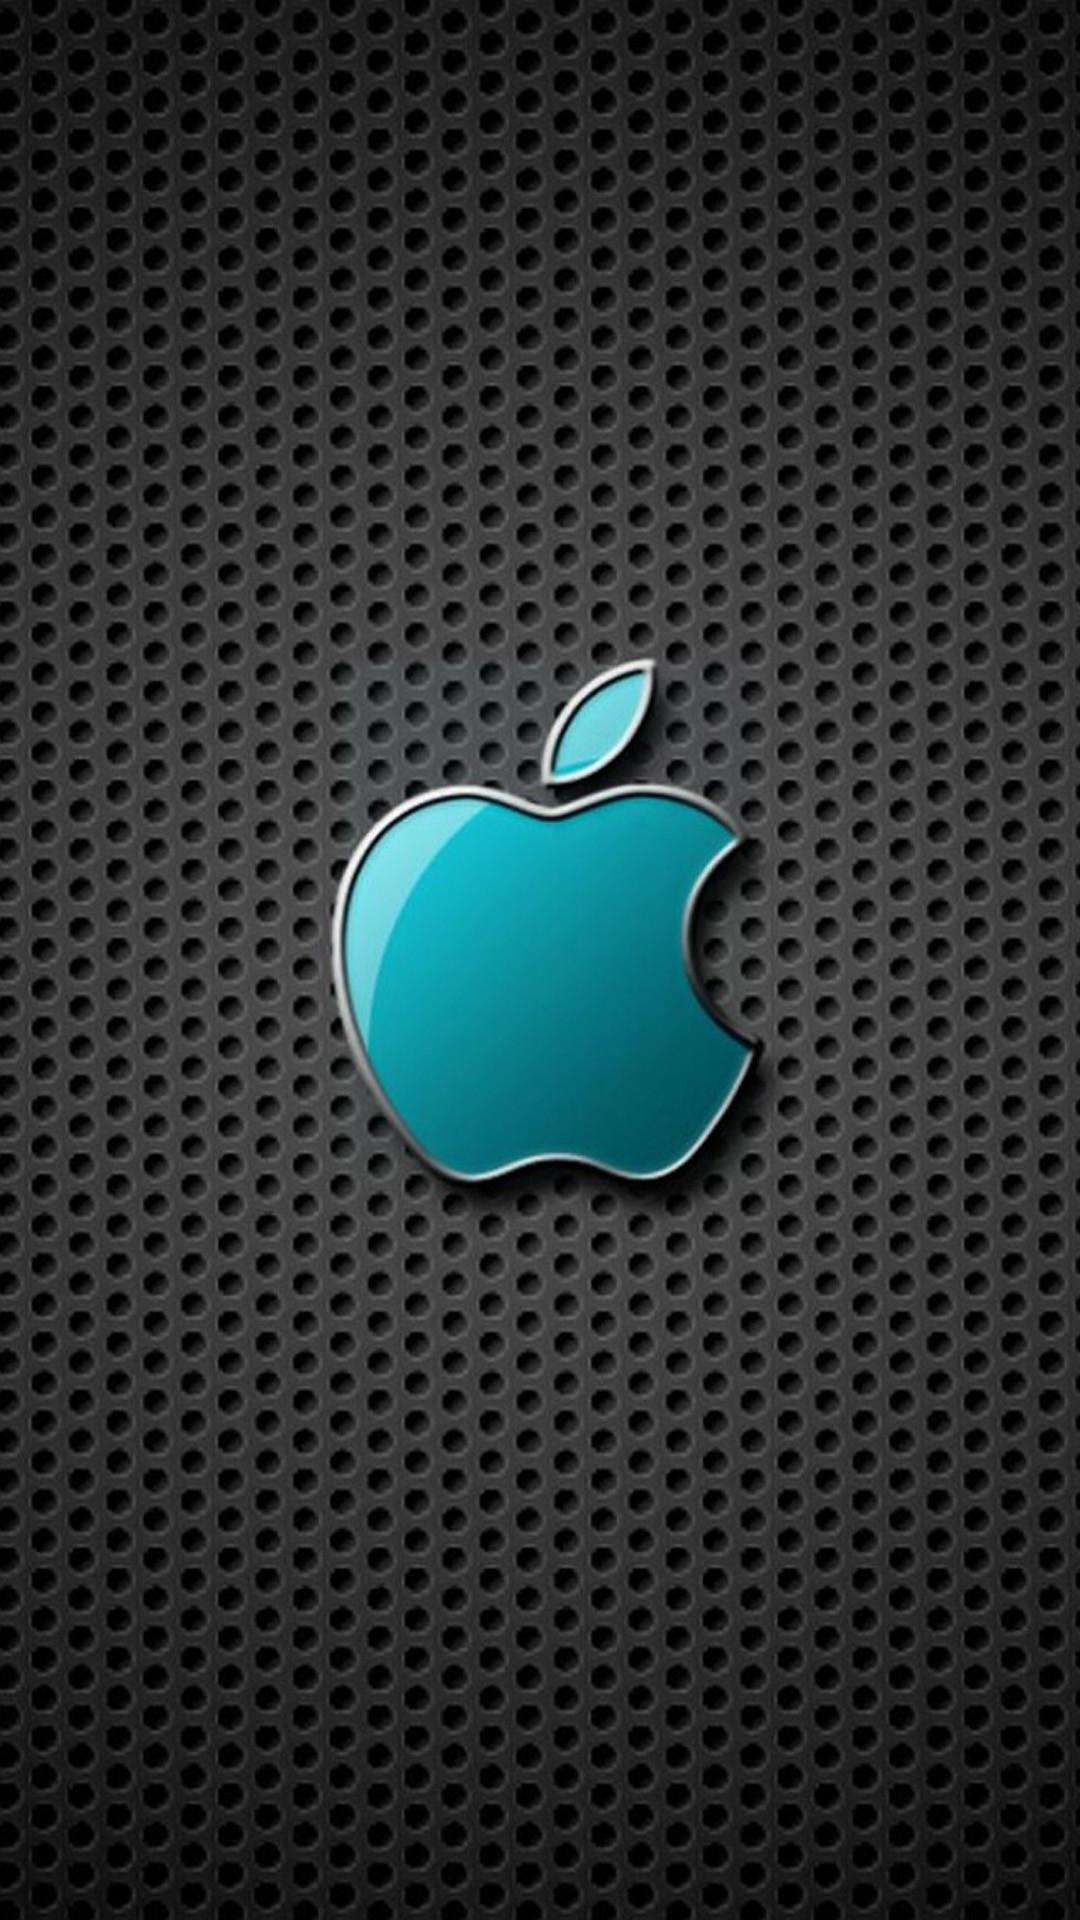 Metal Apple Wallpaper (71+ images)